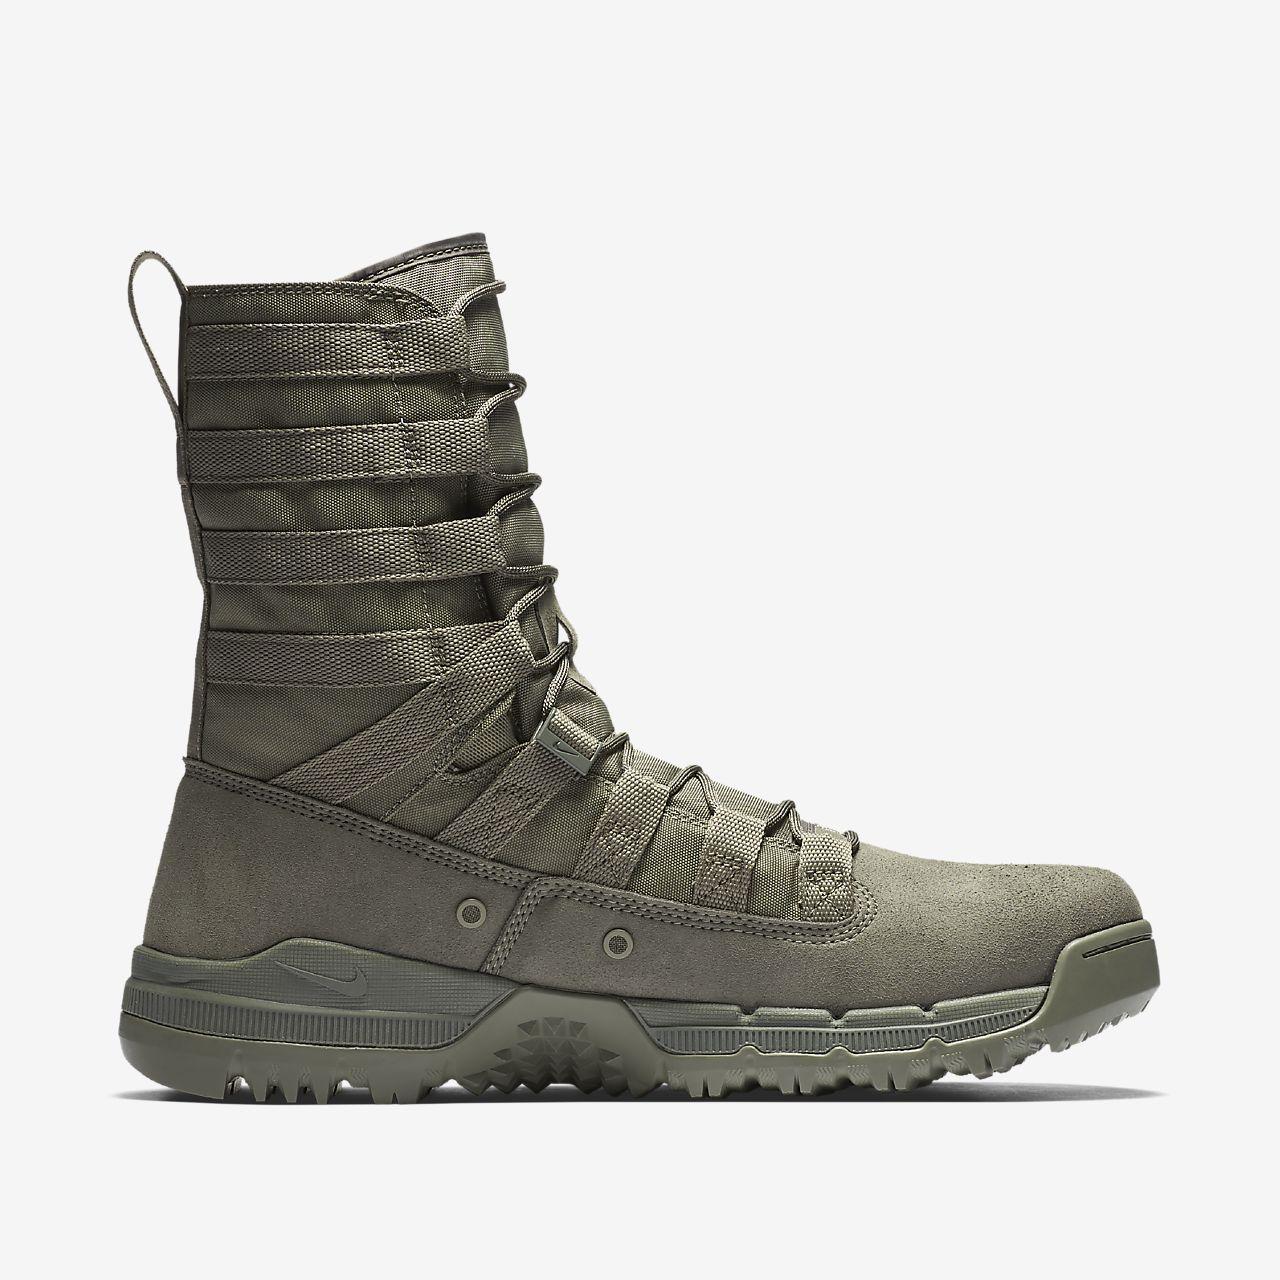 new products 33c6c 2dbca ... Nike SFB Gen 2 8